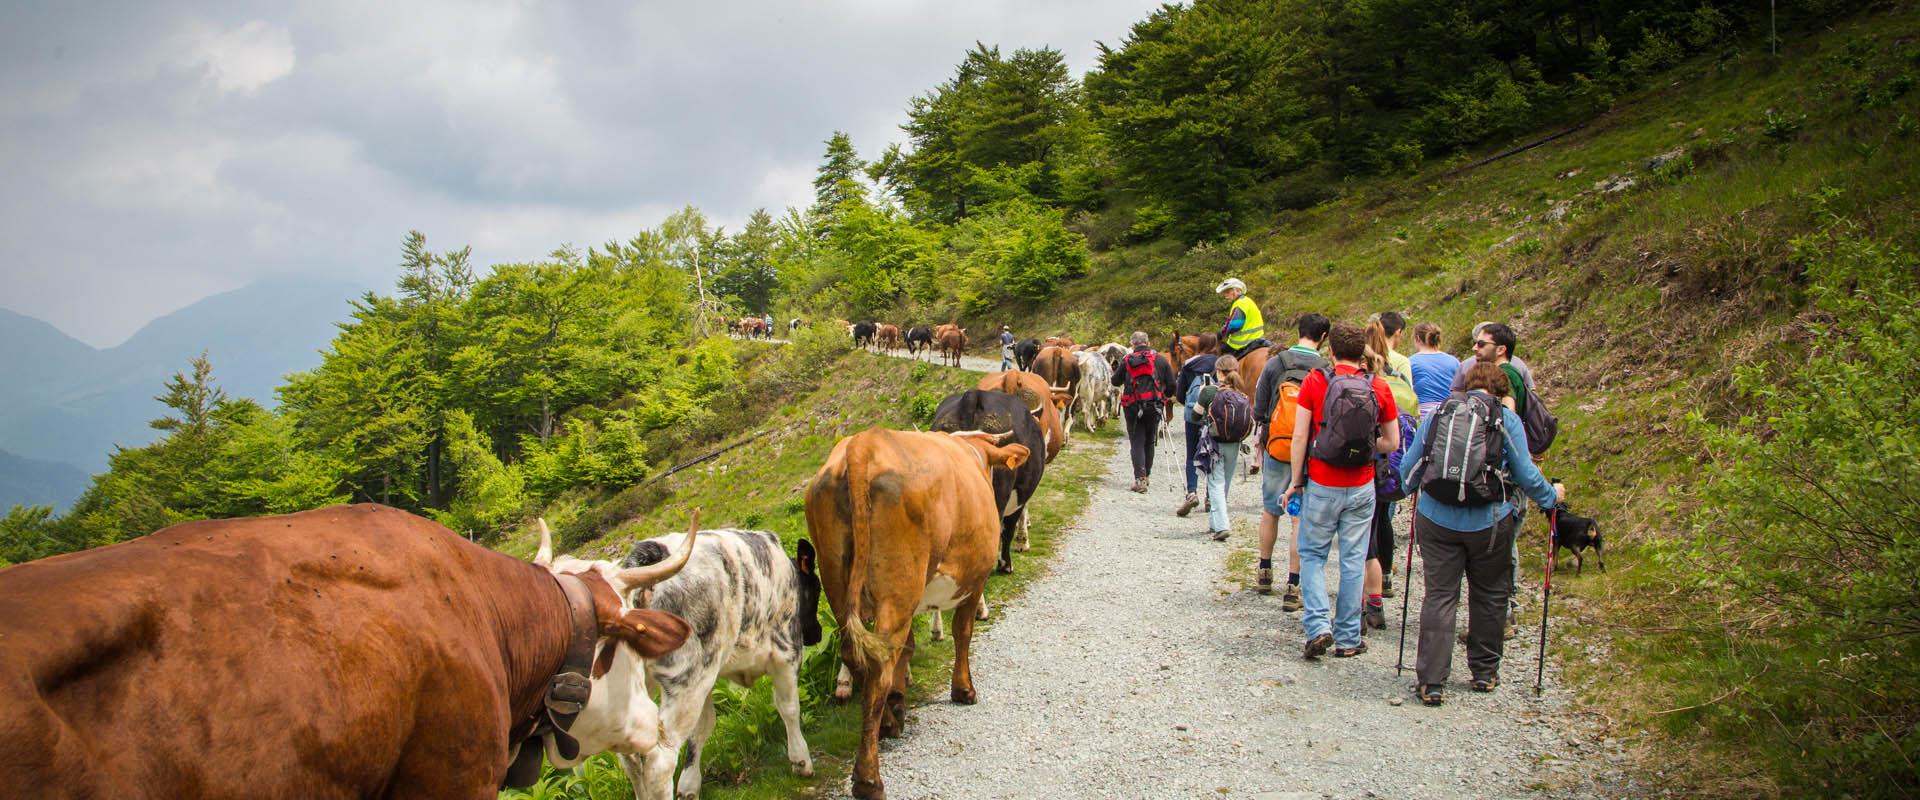 alpemoncerchio-trasumando-trekking